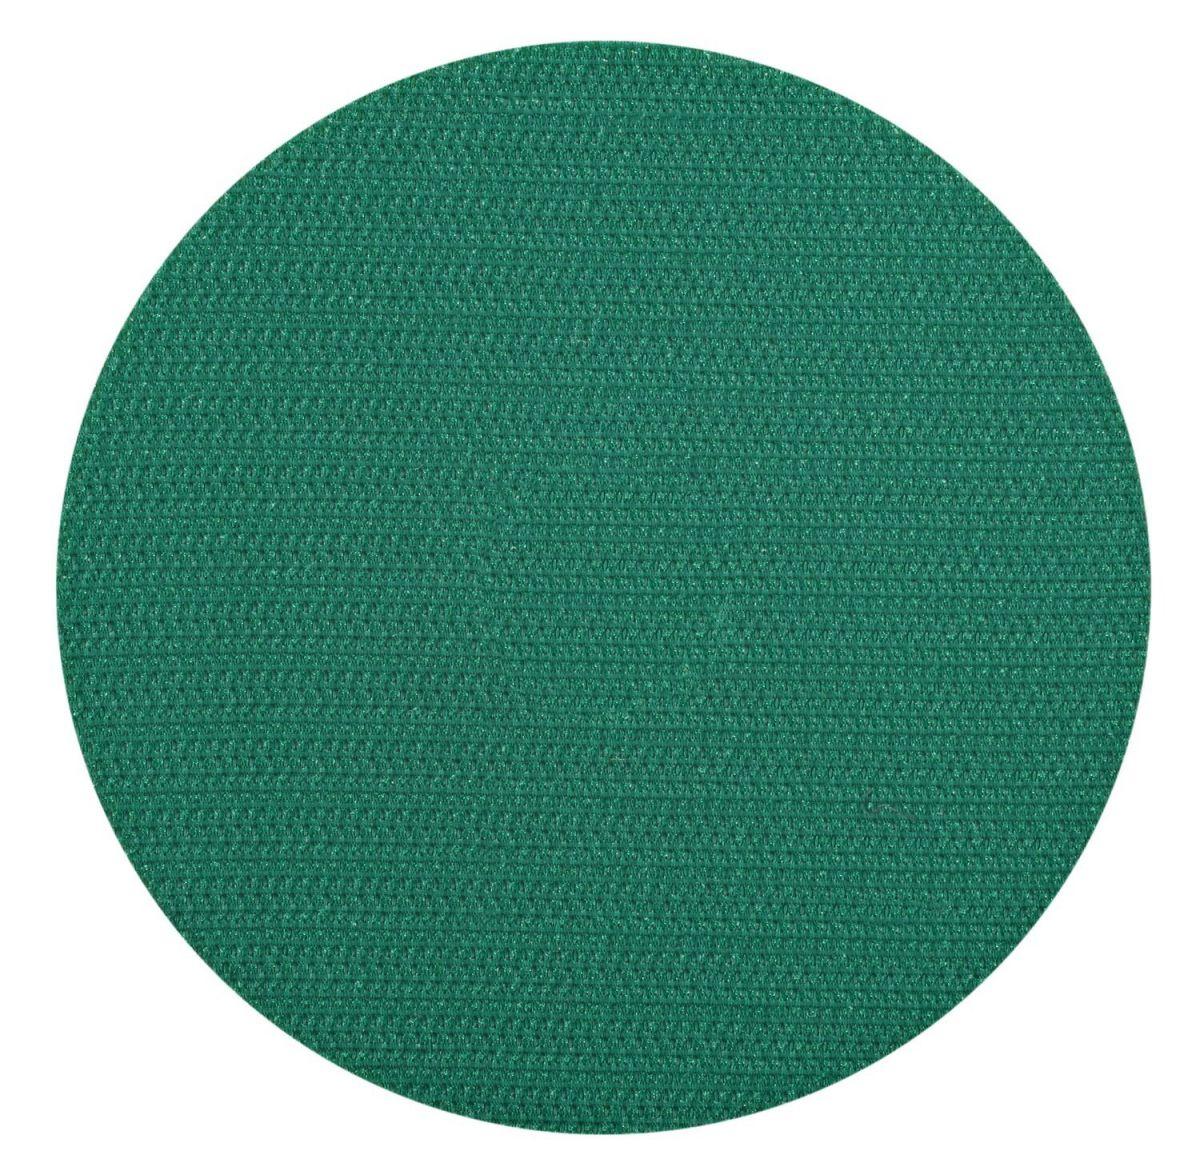 62286 hkt backup pad 125mm green std